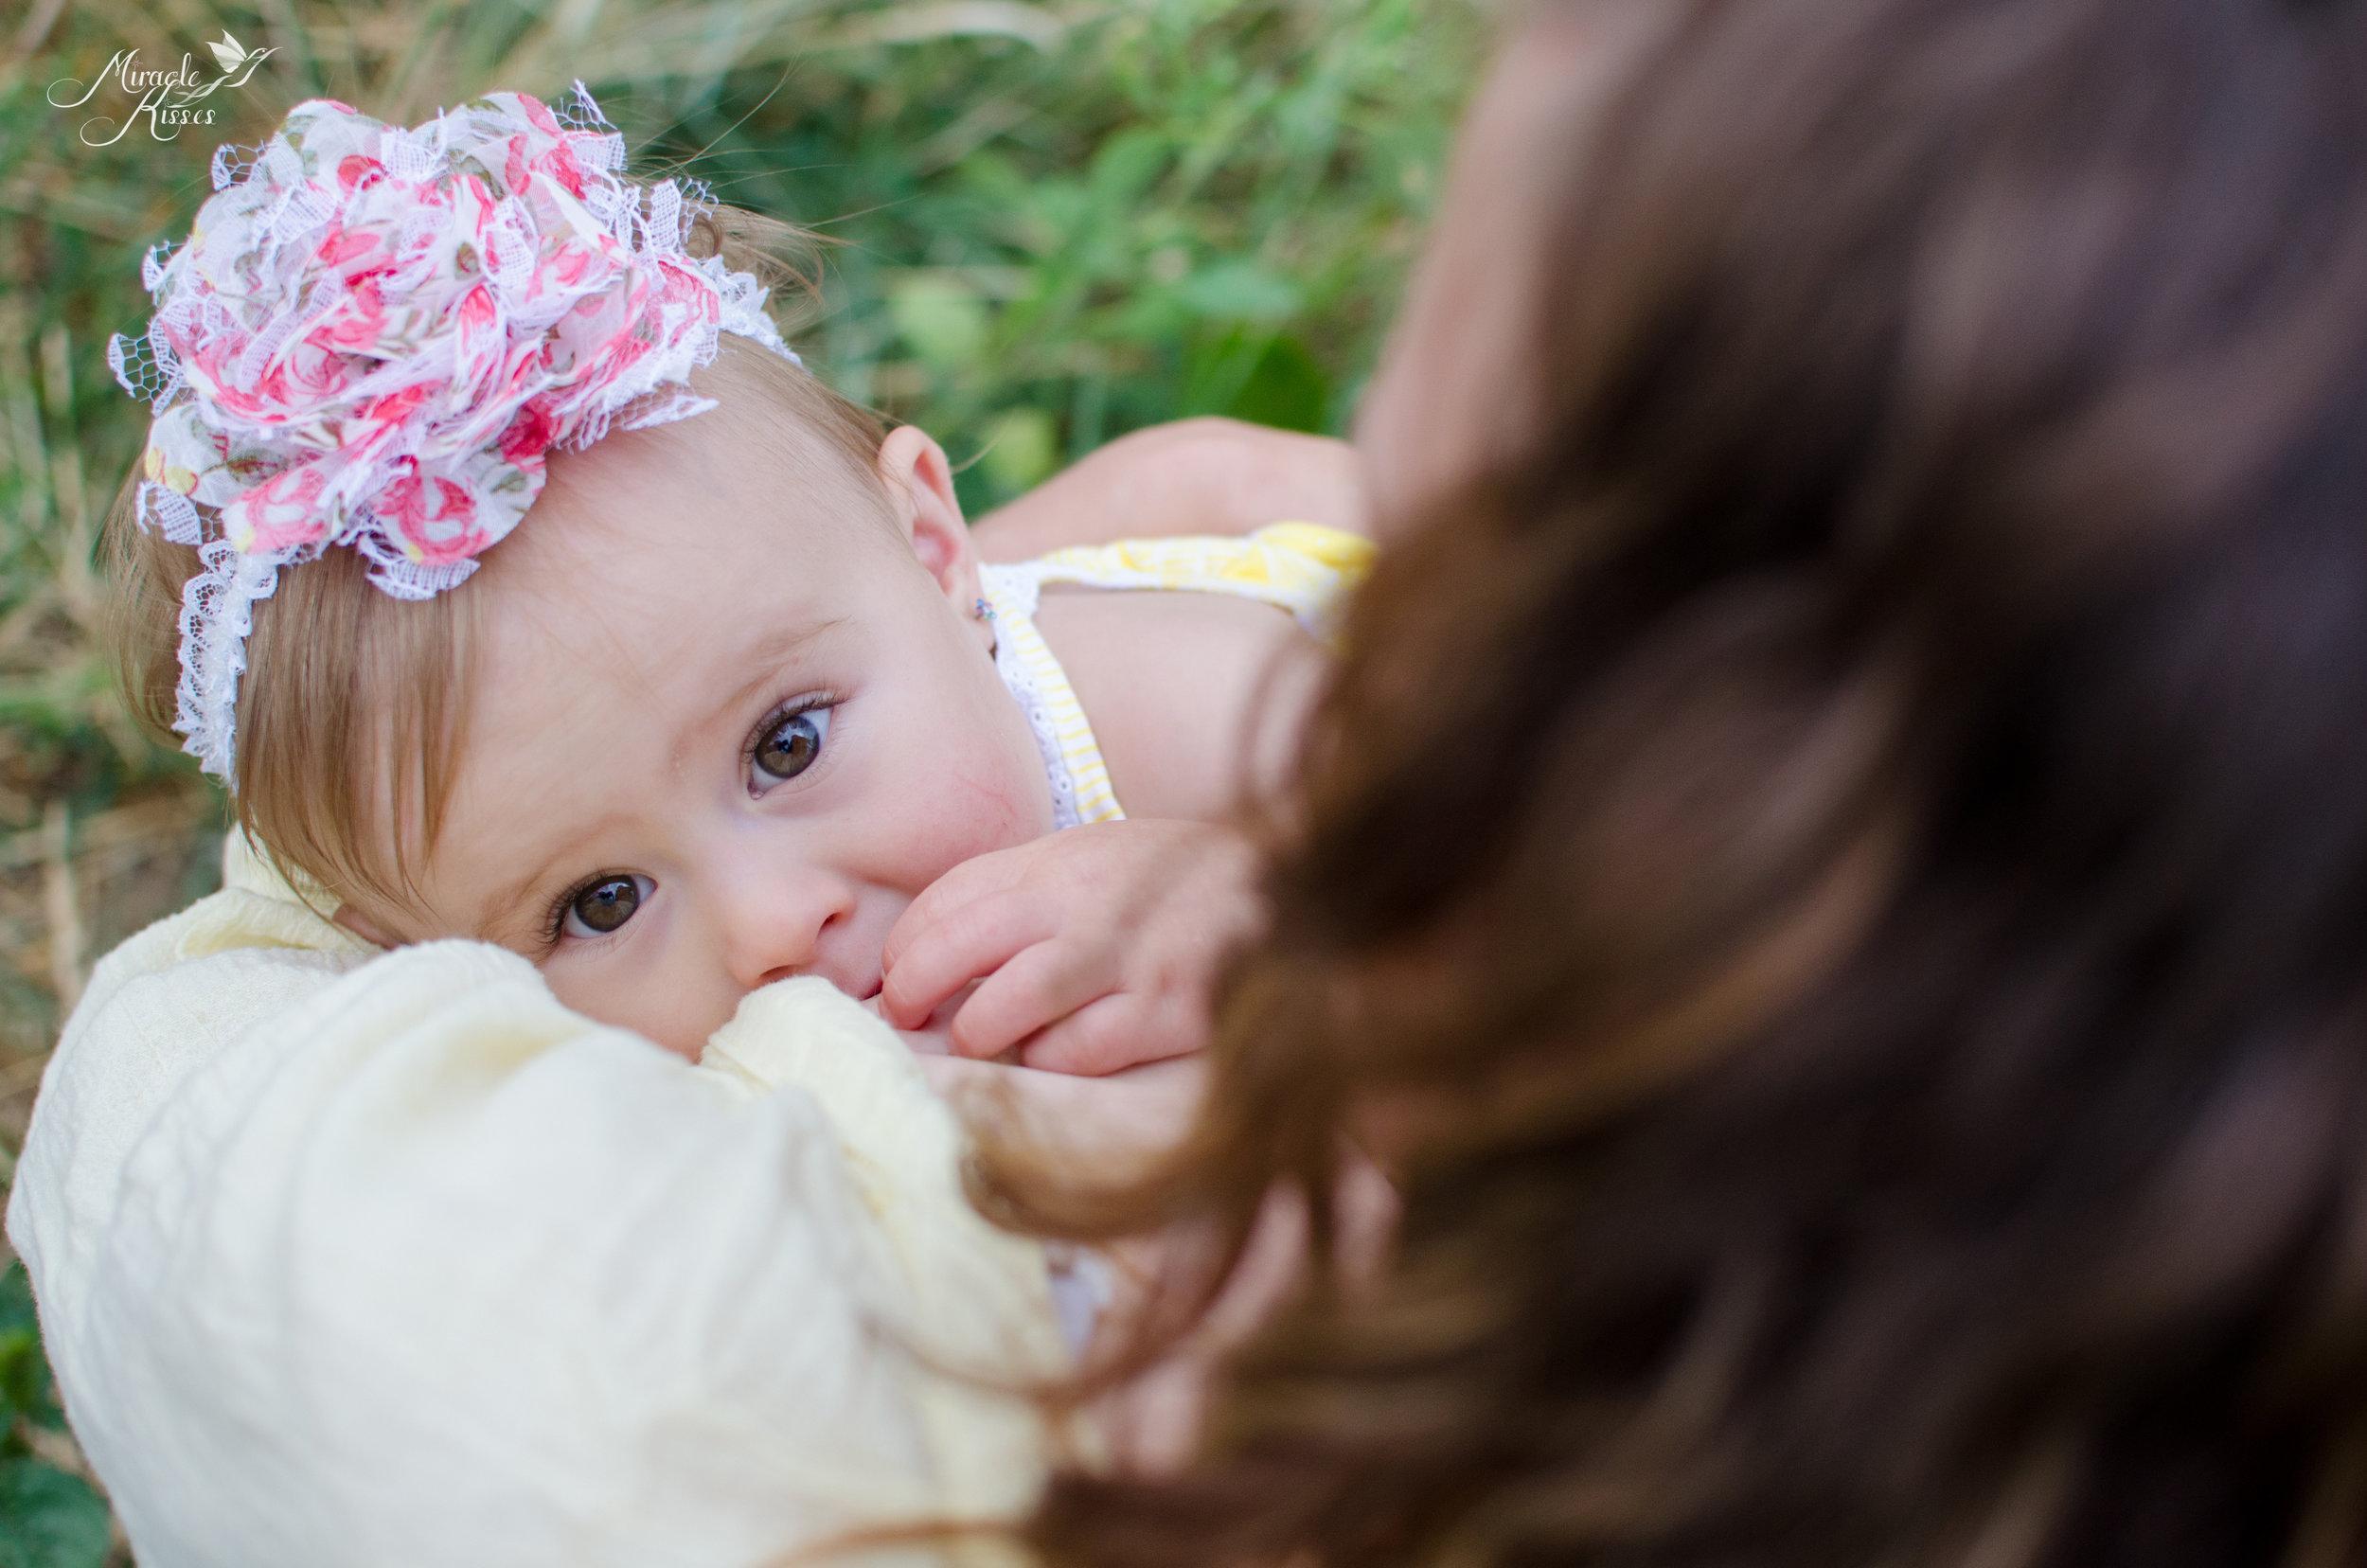 one year breastfeeding milestone, breastfeeding encouragement, 31 days 31 stores